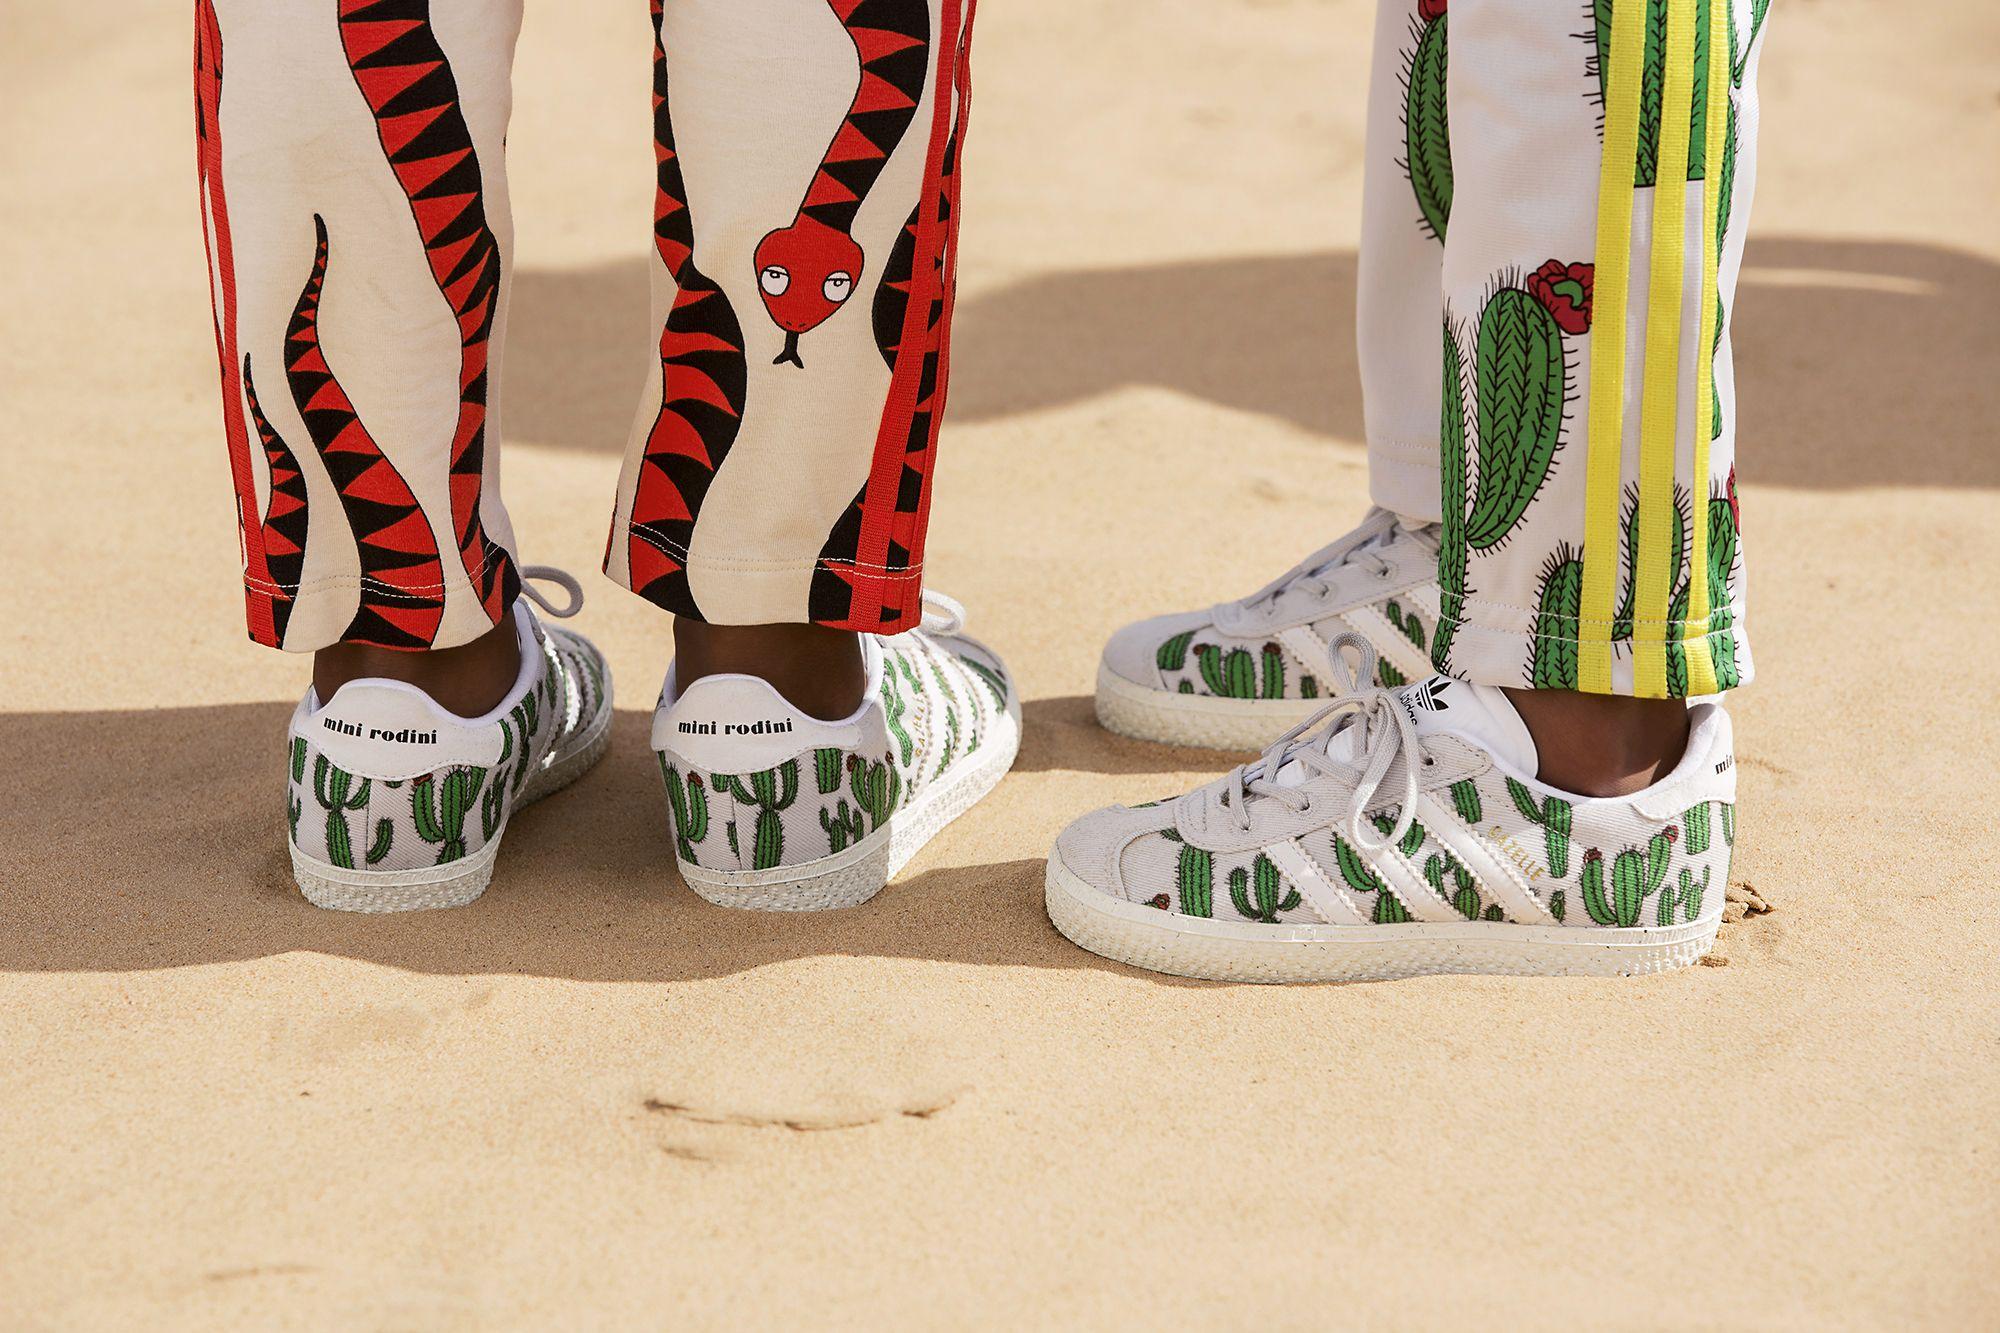 Shoes | Kids wear, Kids fashion, Shoes editorial